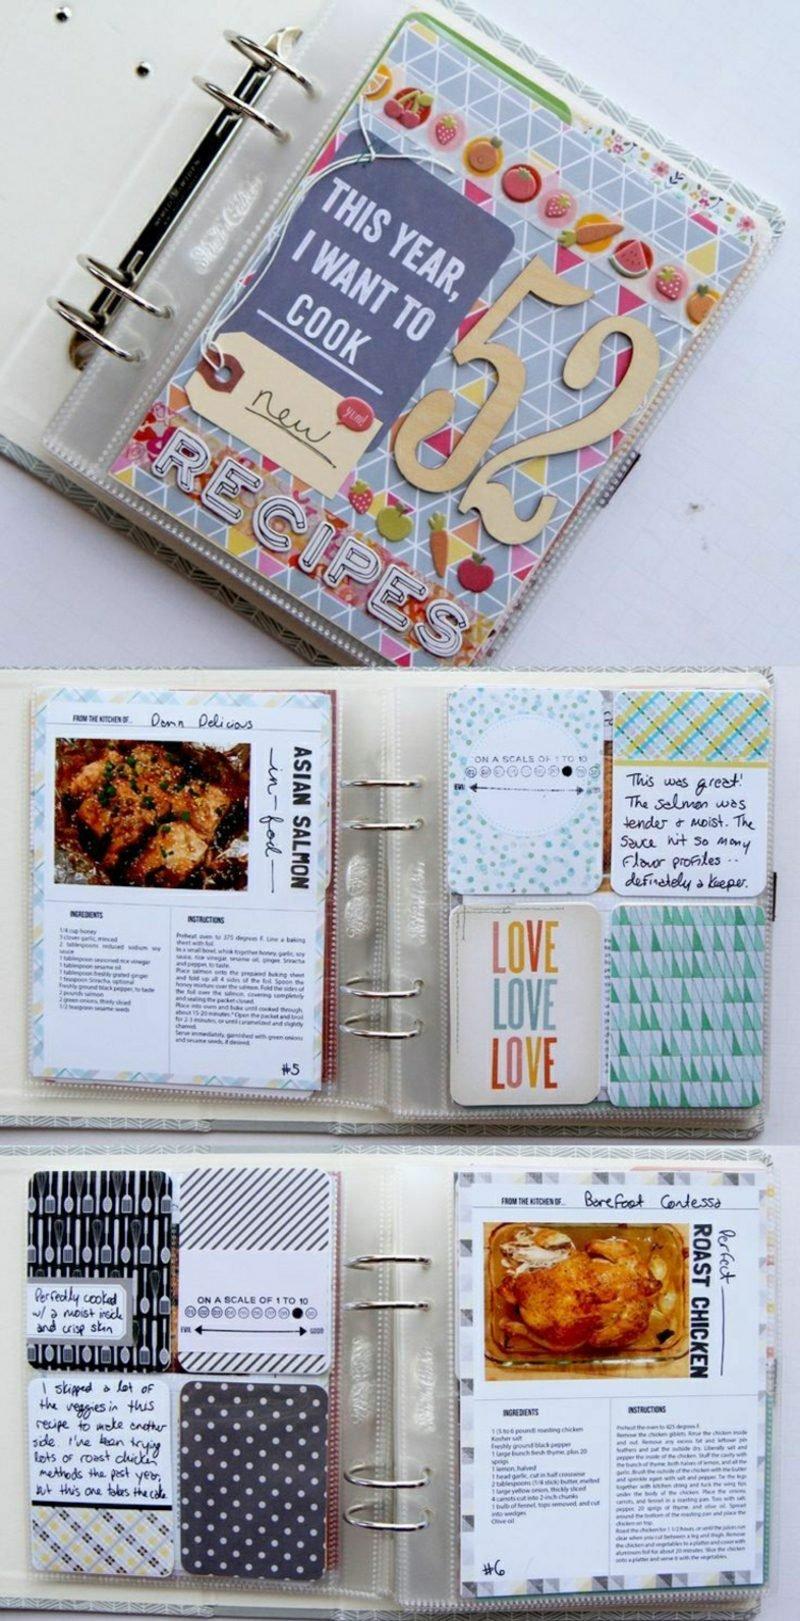 Kochbuch selbst gestalten eindrucksvolle Idee